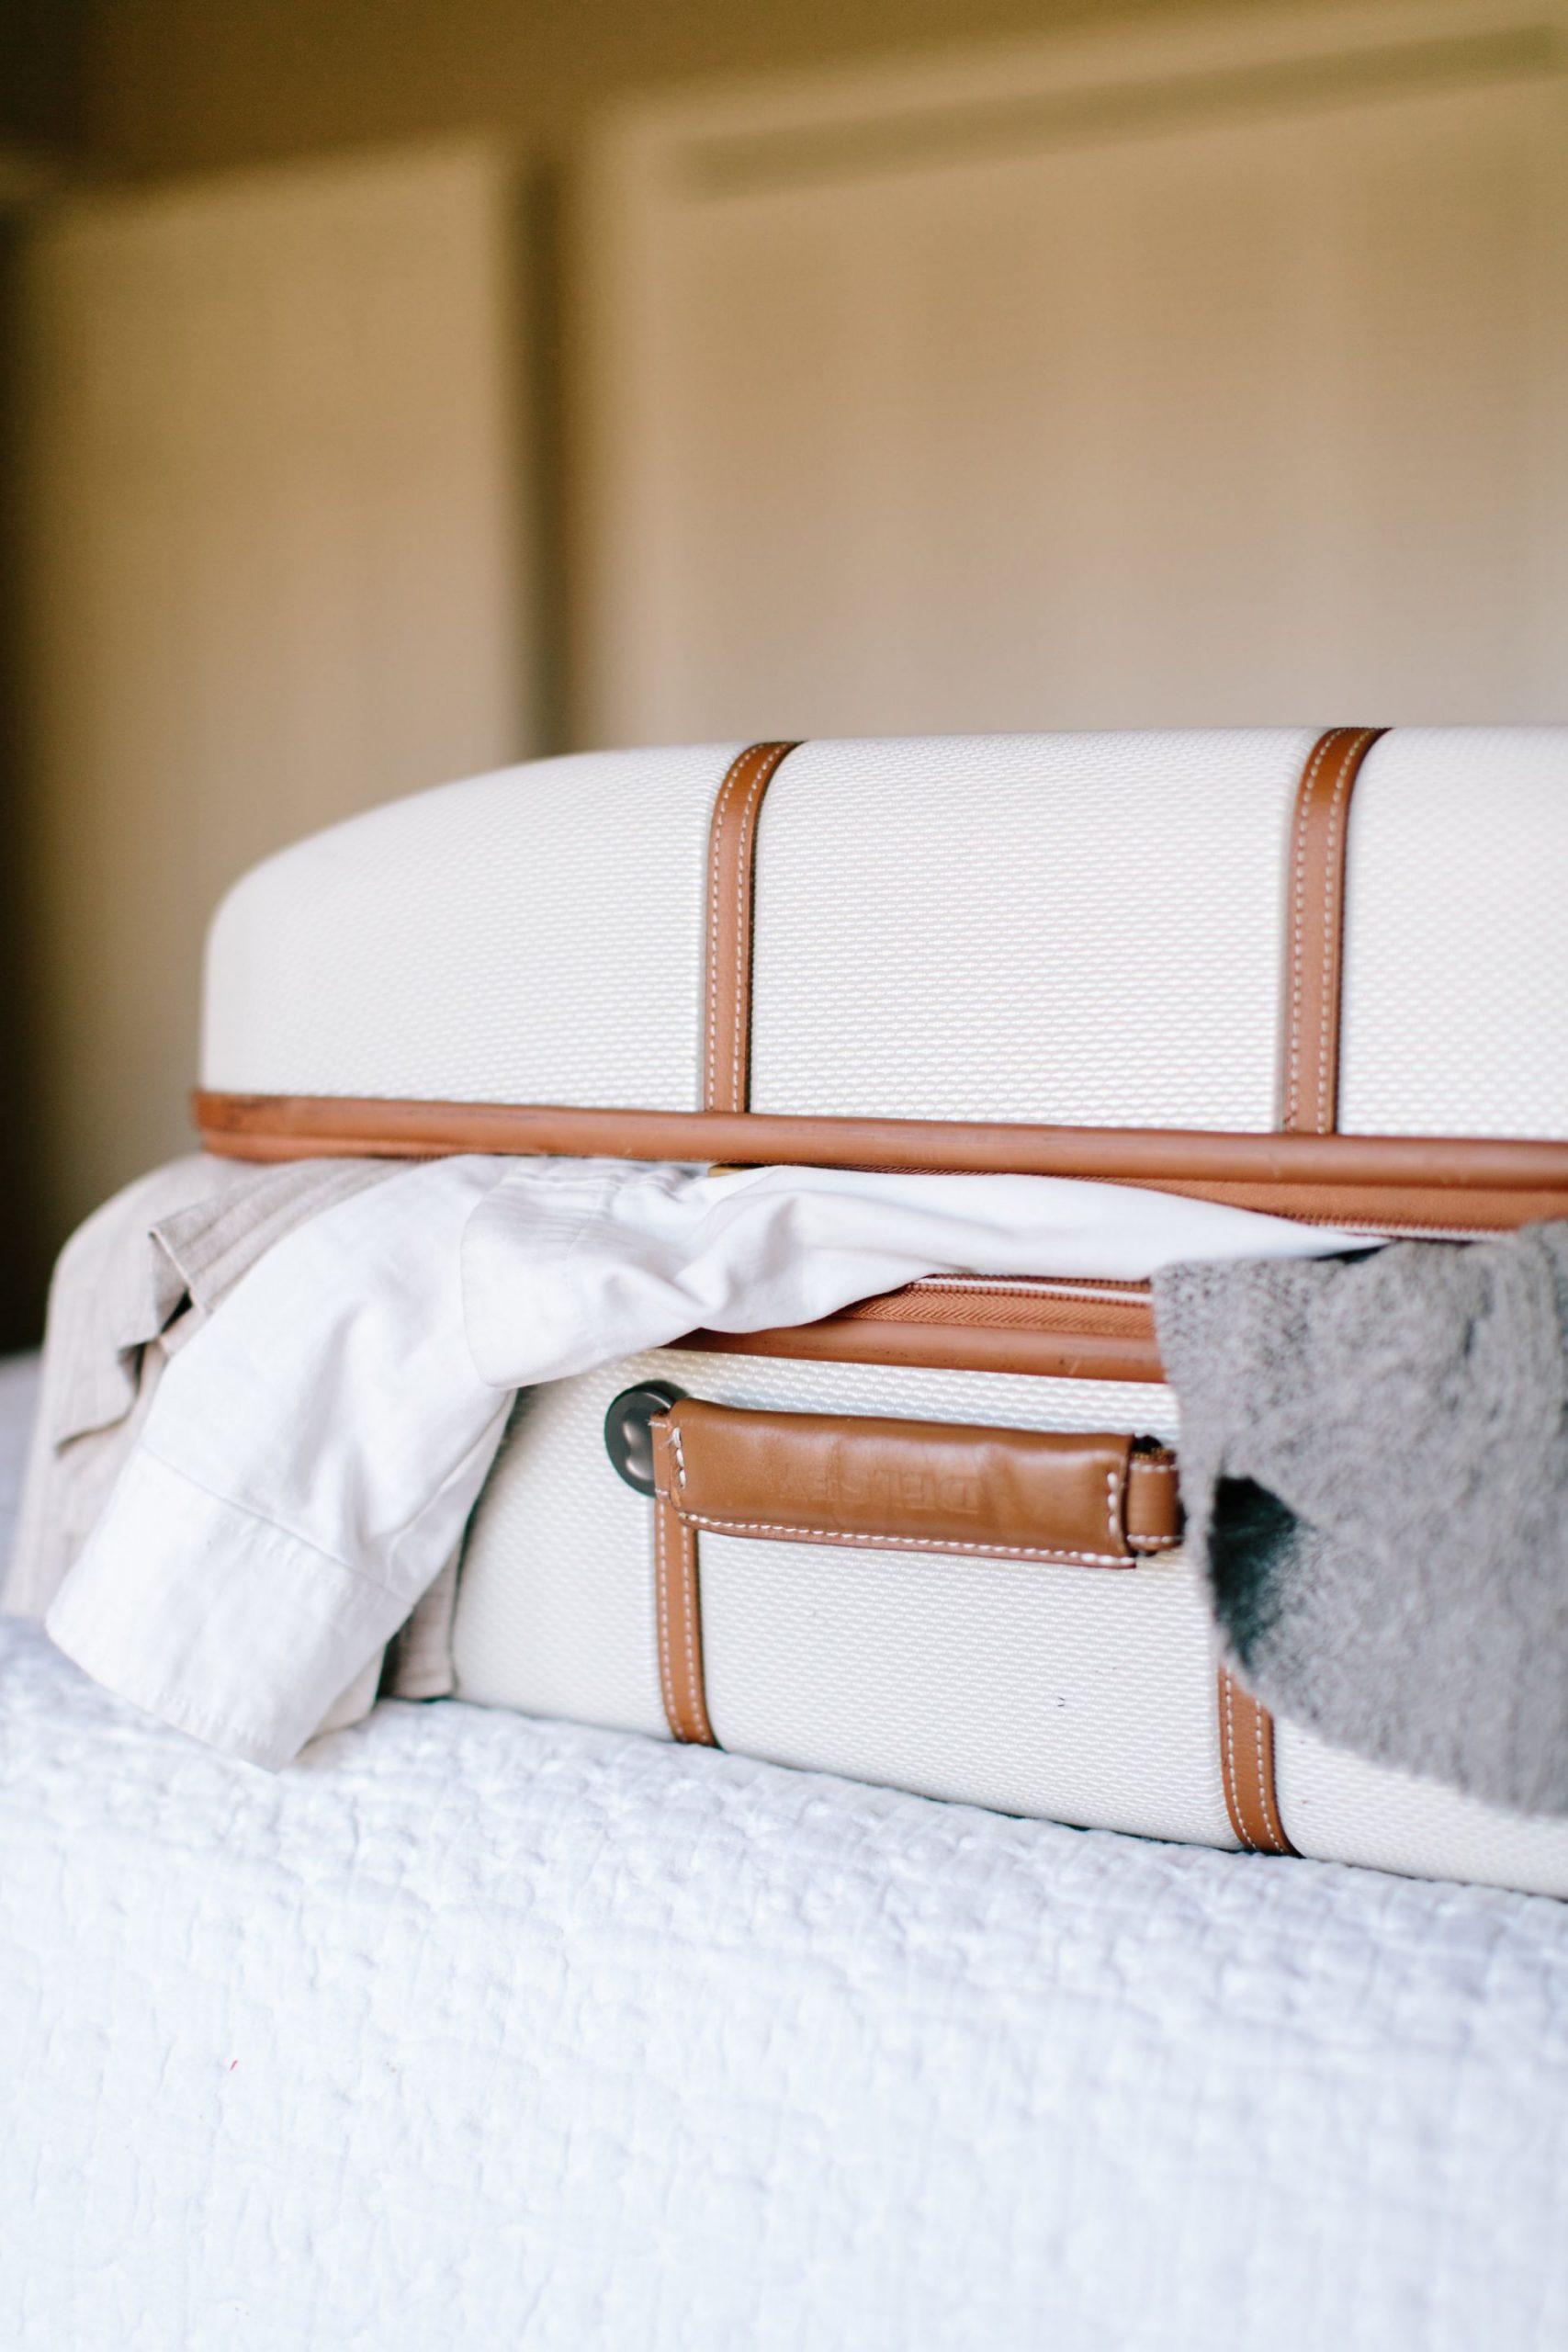 11 Hospital Bag Essentials for Expecting Moms